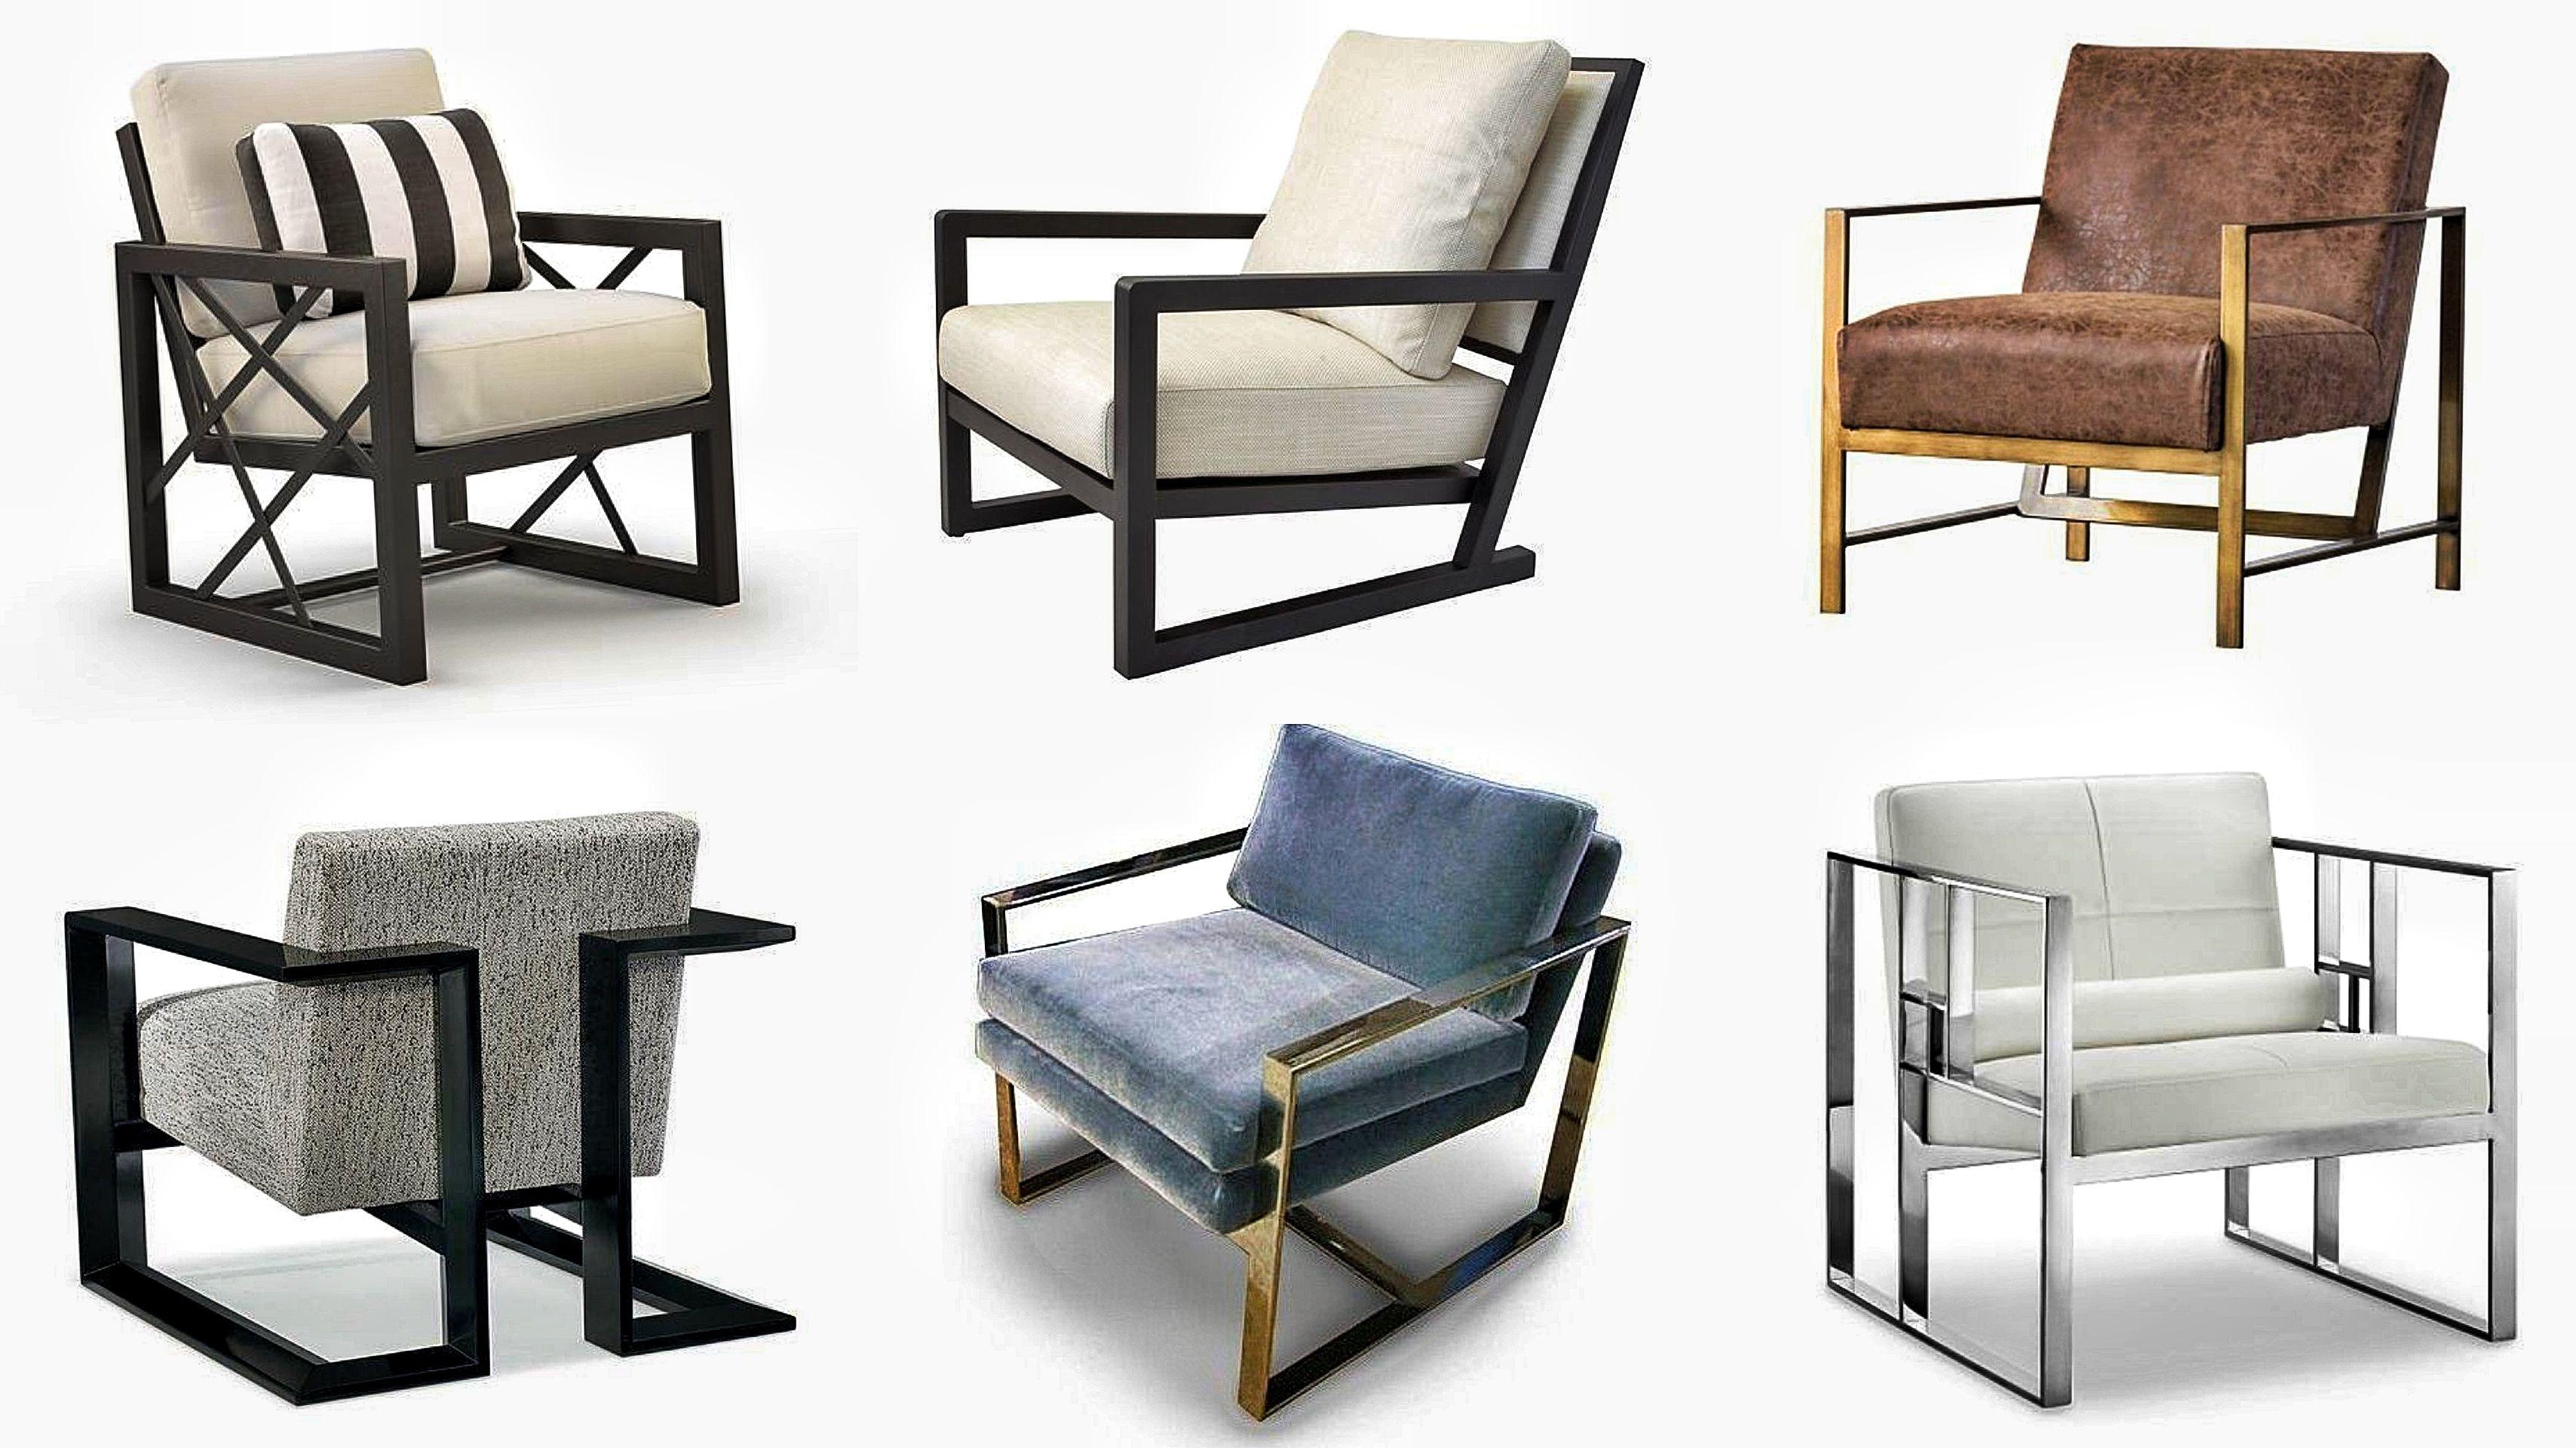 50 Metal Chair Design Ideas Metal Furniture Design And Steel Ideas 2021 In 2021 Chair Design Metal Furniture Design Furniture Design